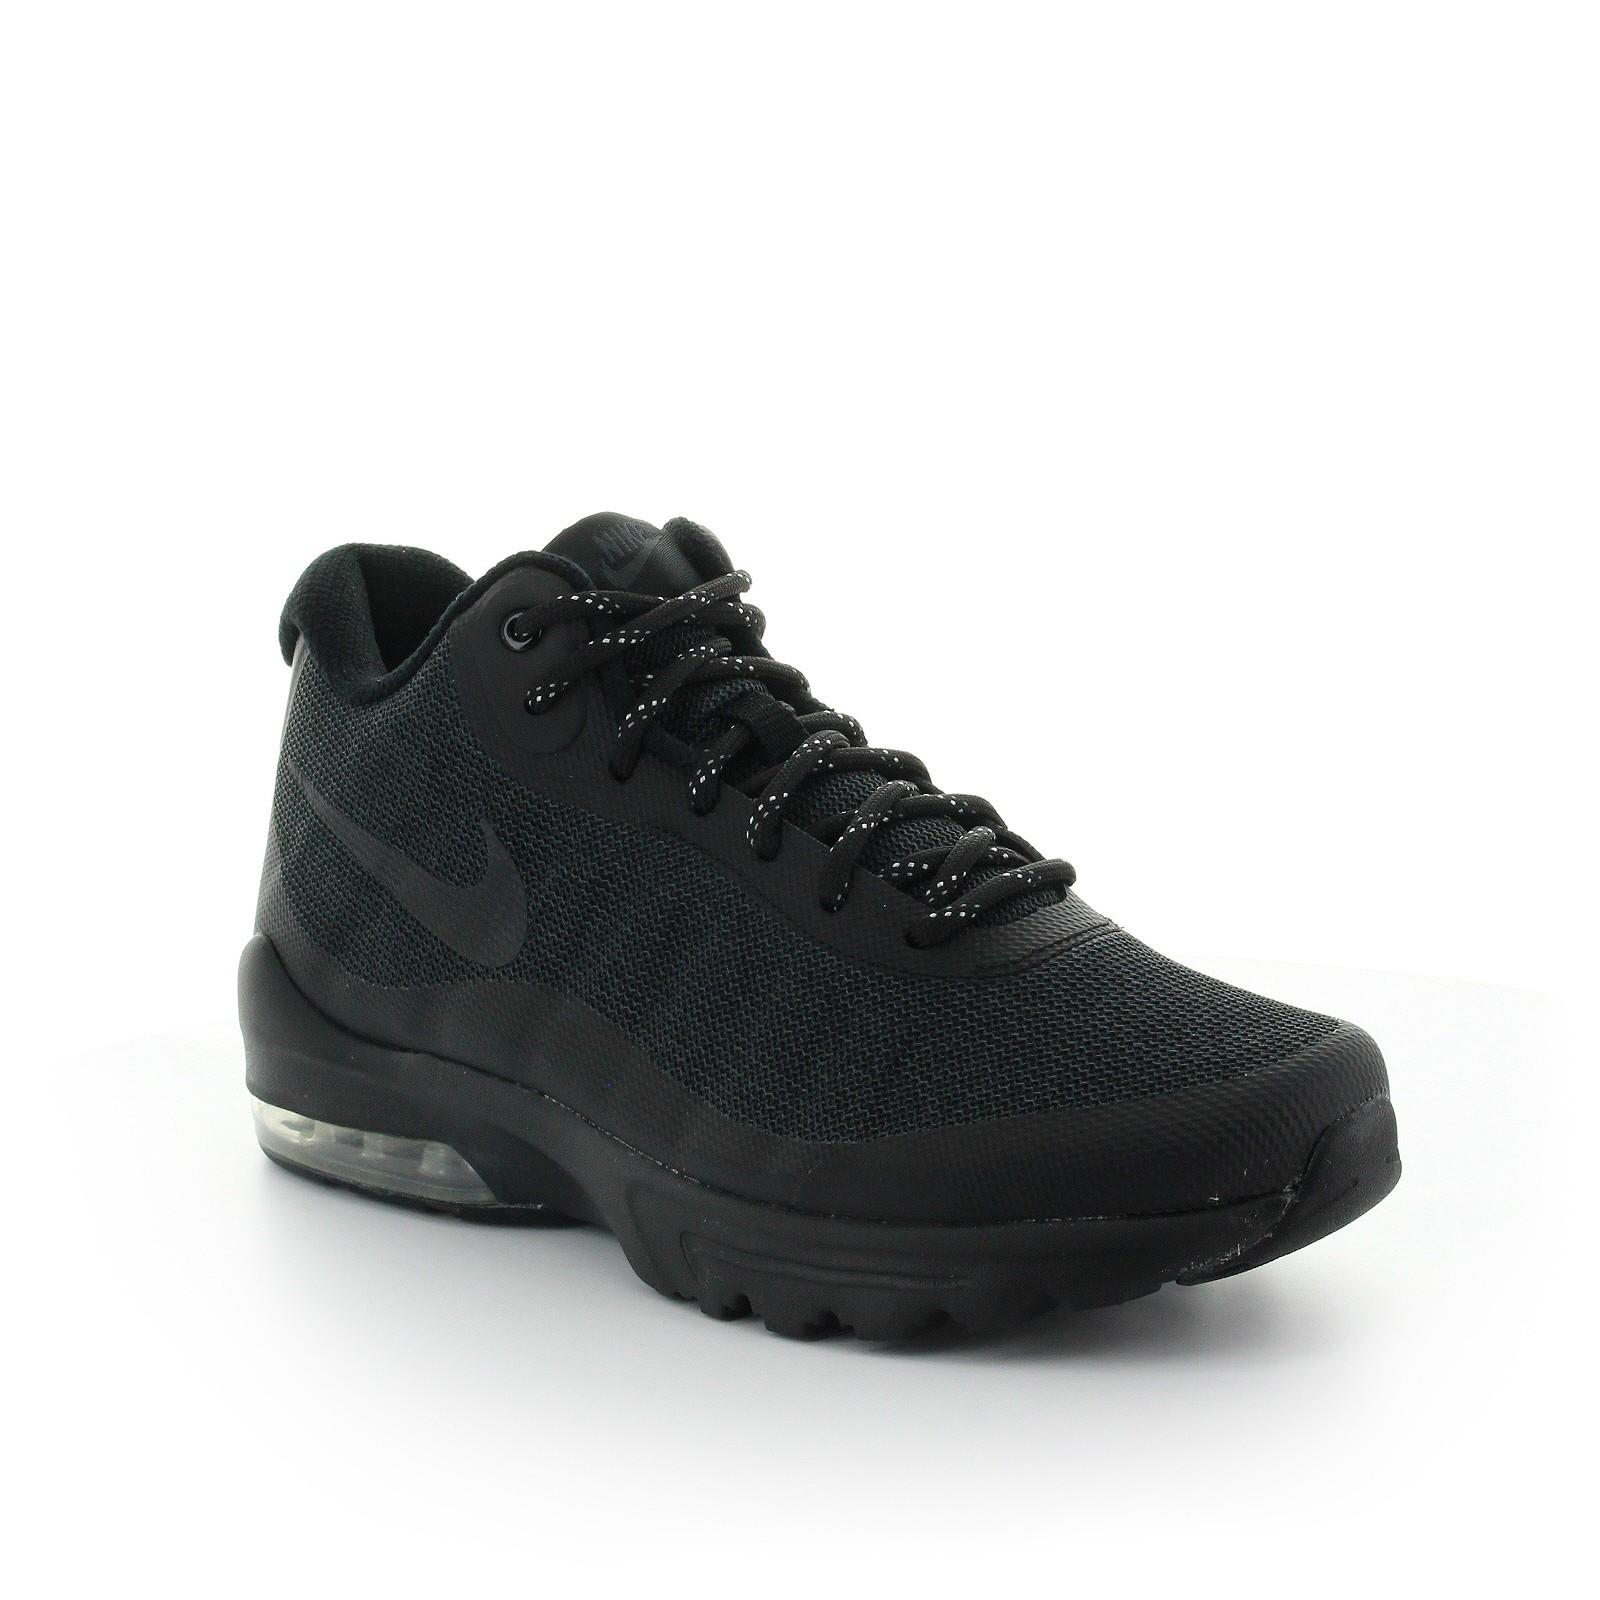 sneakers mid Nike nike air max invigor mid - Маратонки - Обувки ... a3df842bb